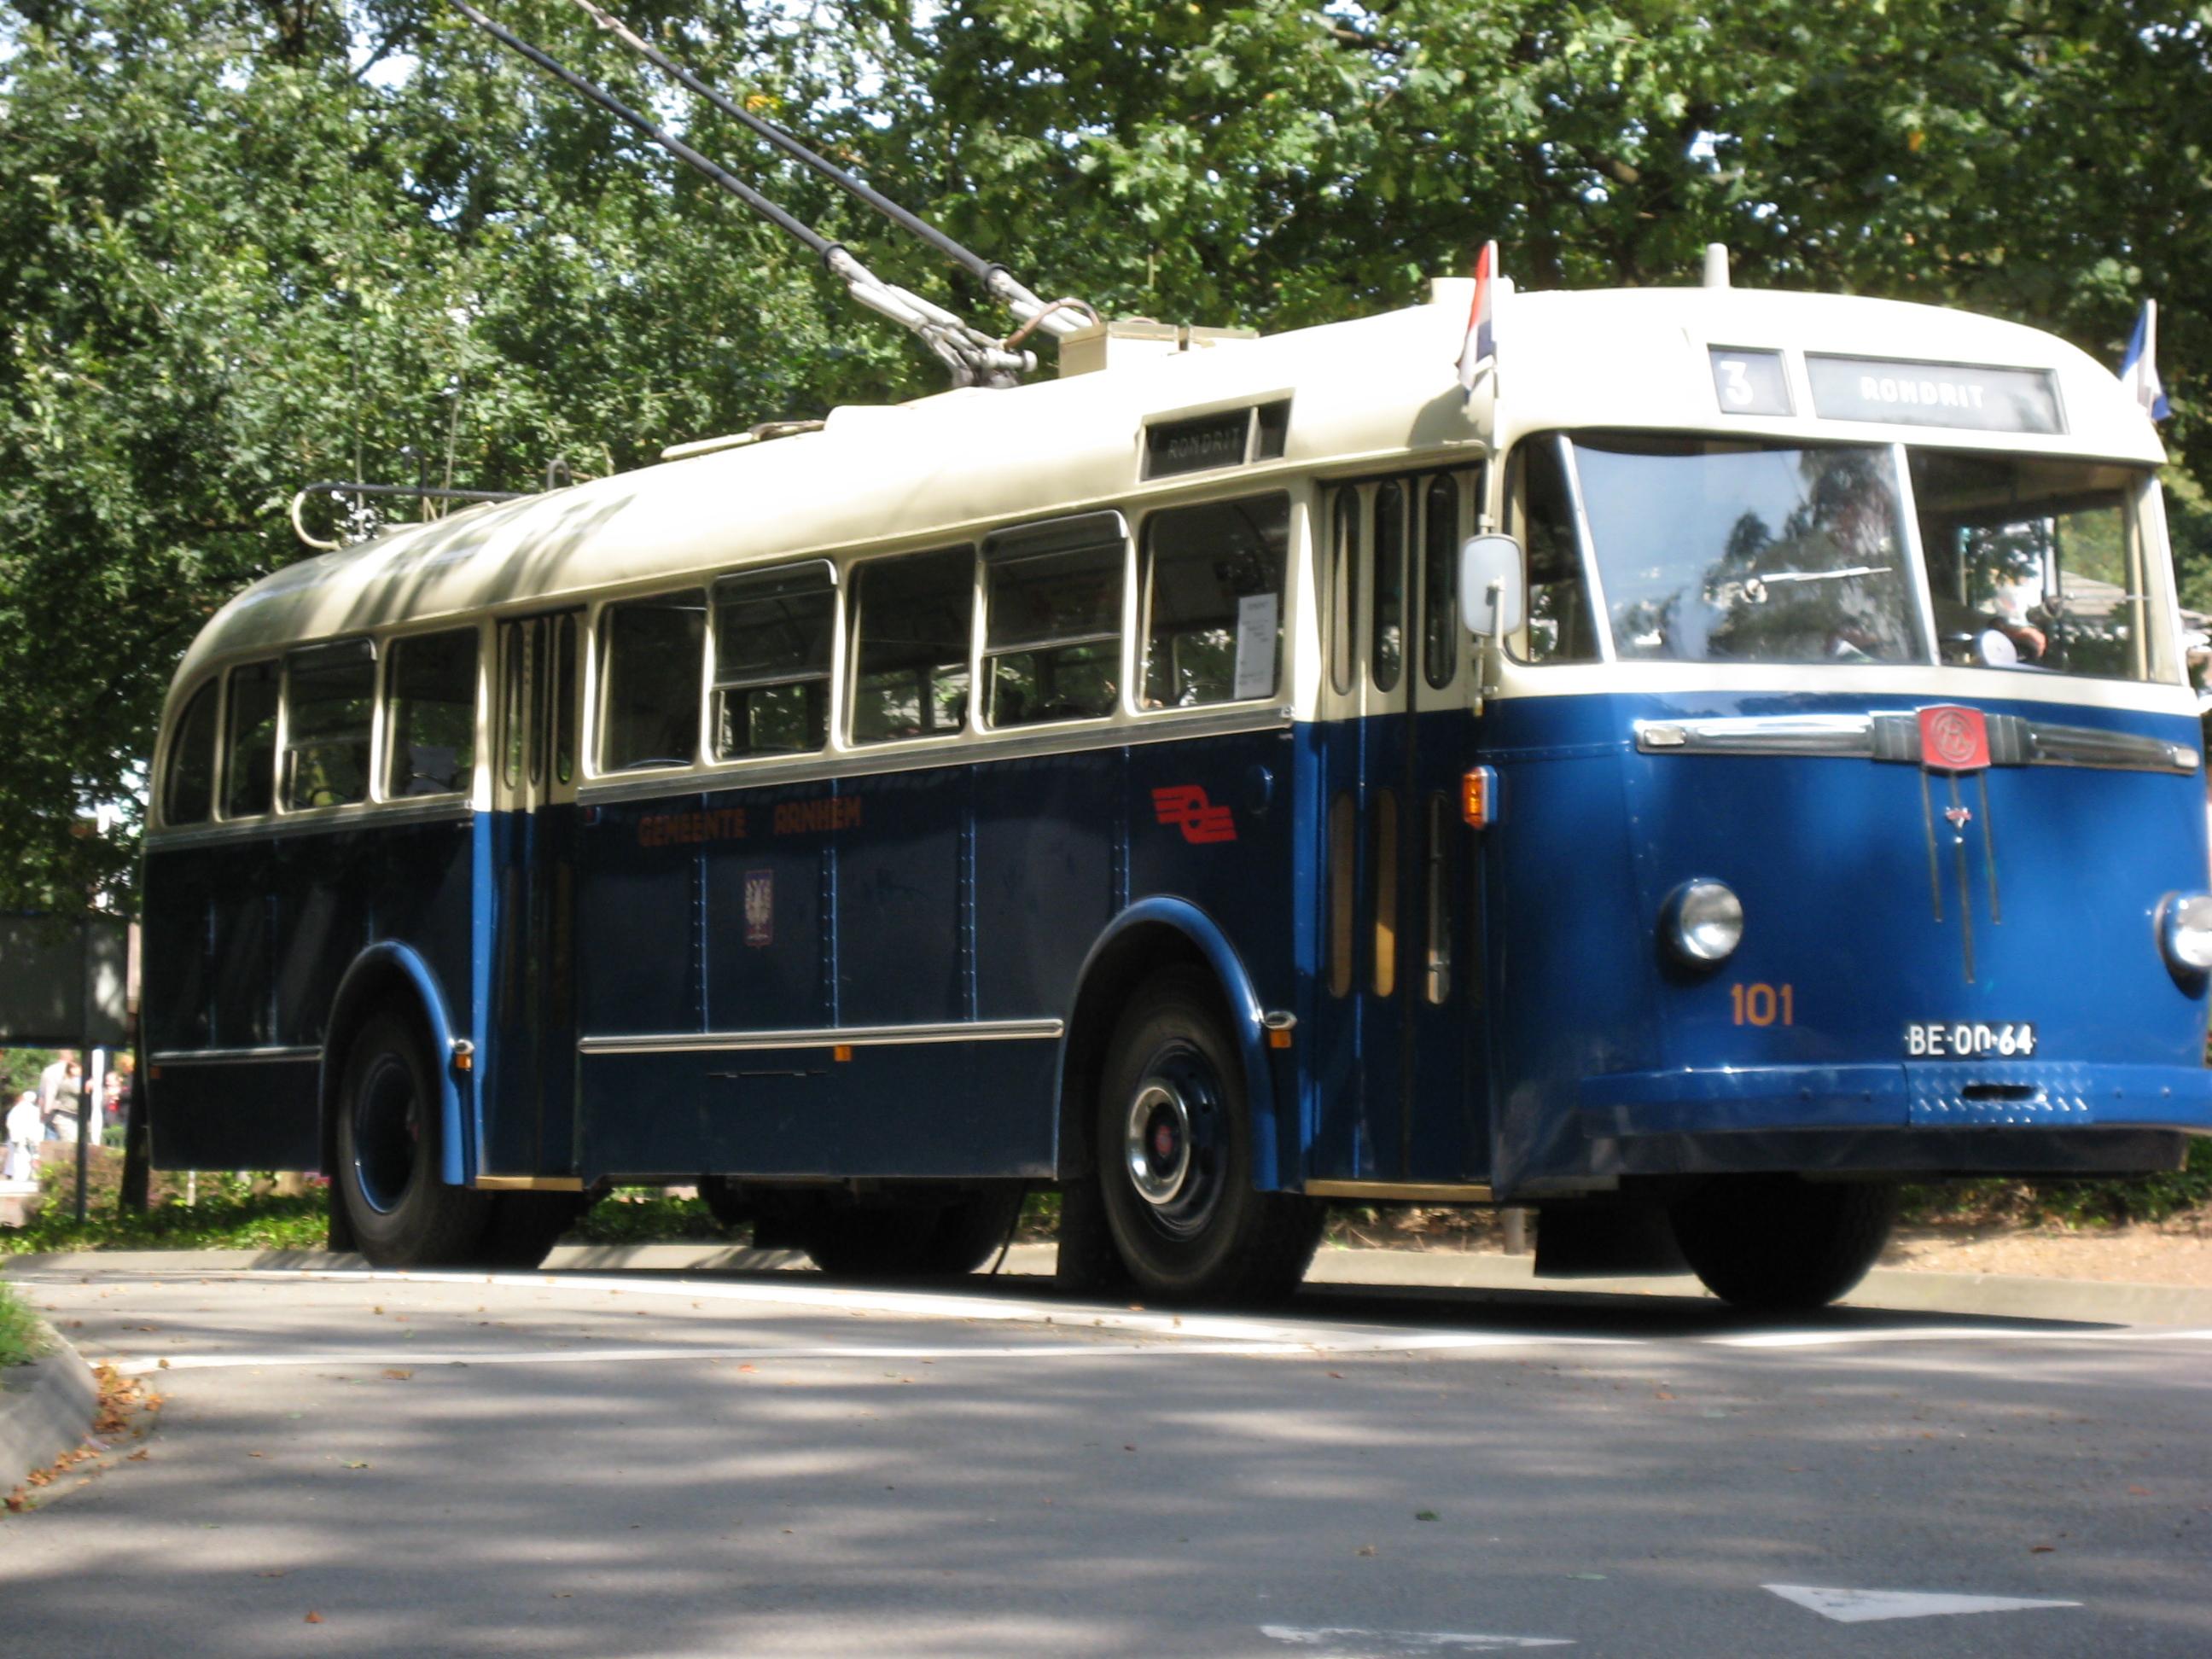 upload.wikimedia.org/wikipedia/commons/d/dd/Trolleybus.JPG